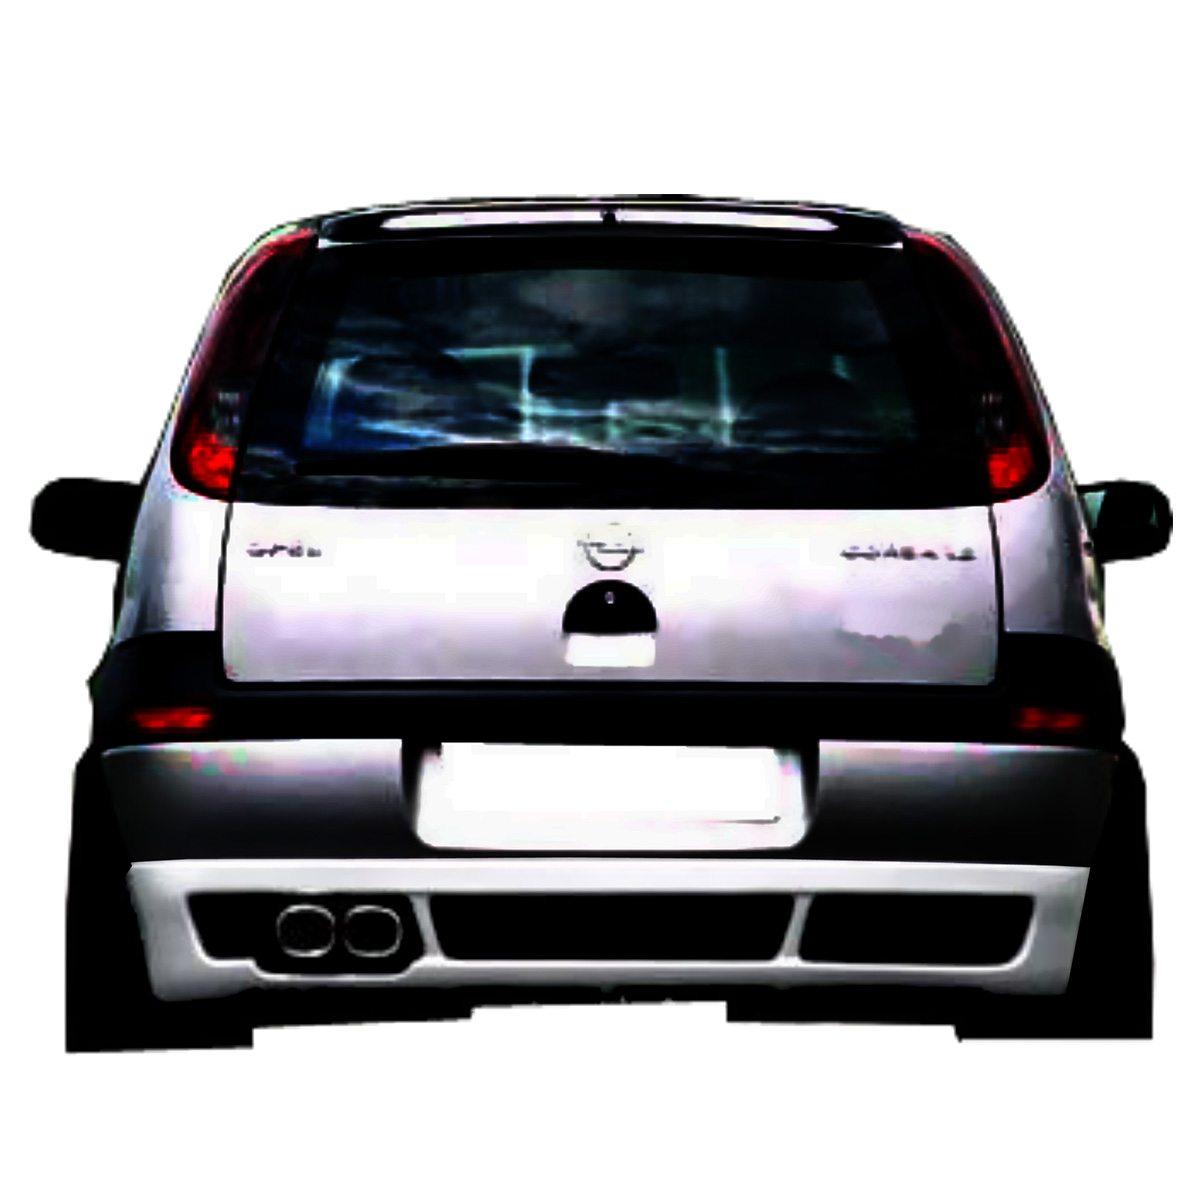 Opel-Corsa-C-RS-Tras-SPA023